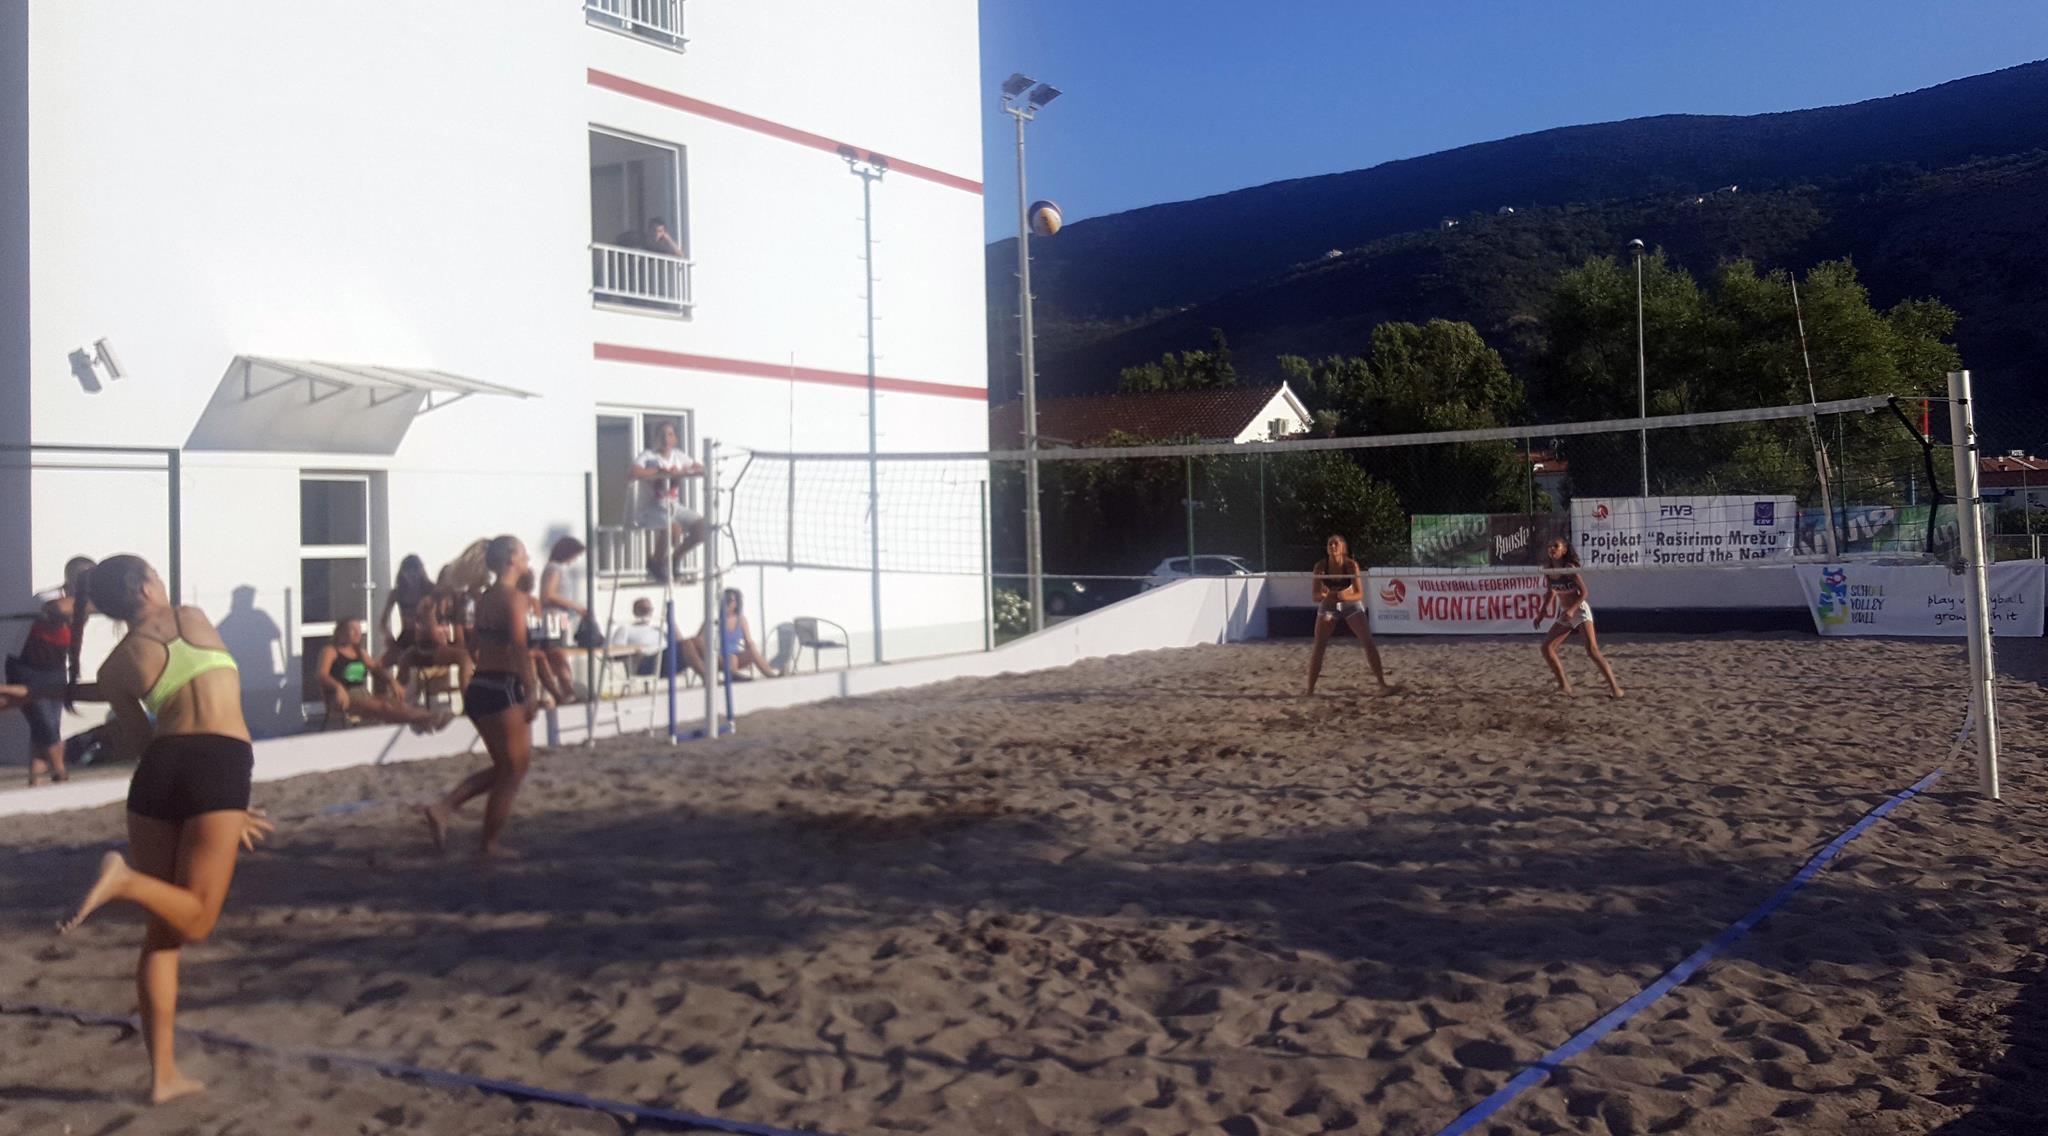 odbojka na pijesku crna gora igalo herceg novi montenegro beach volley 3